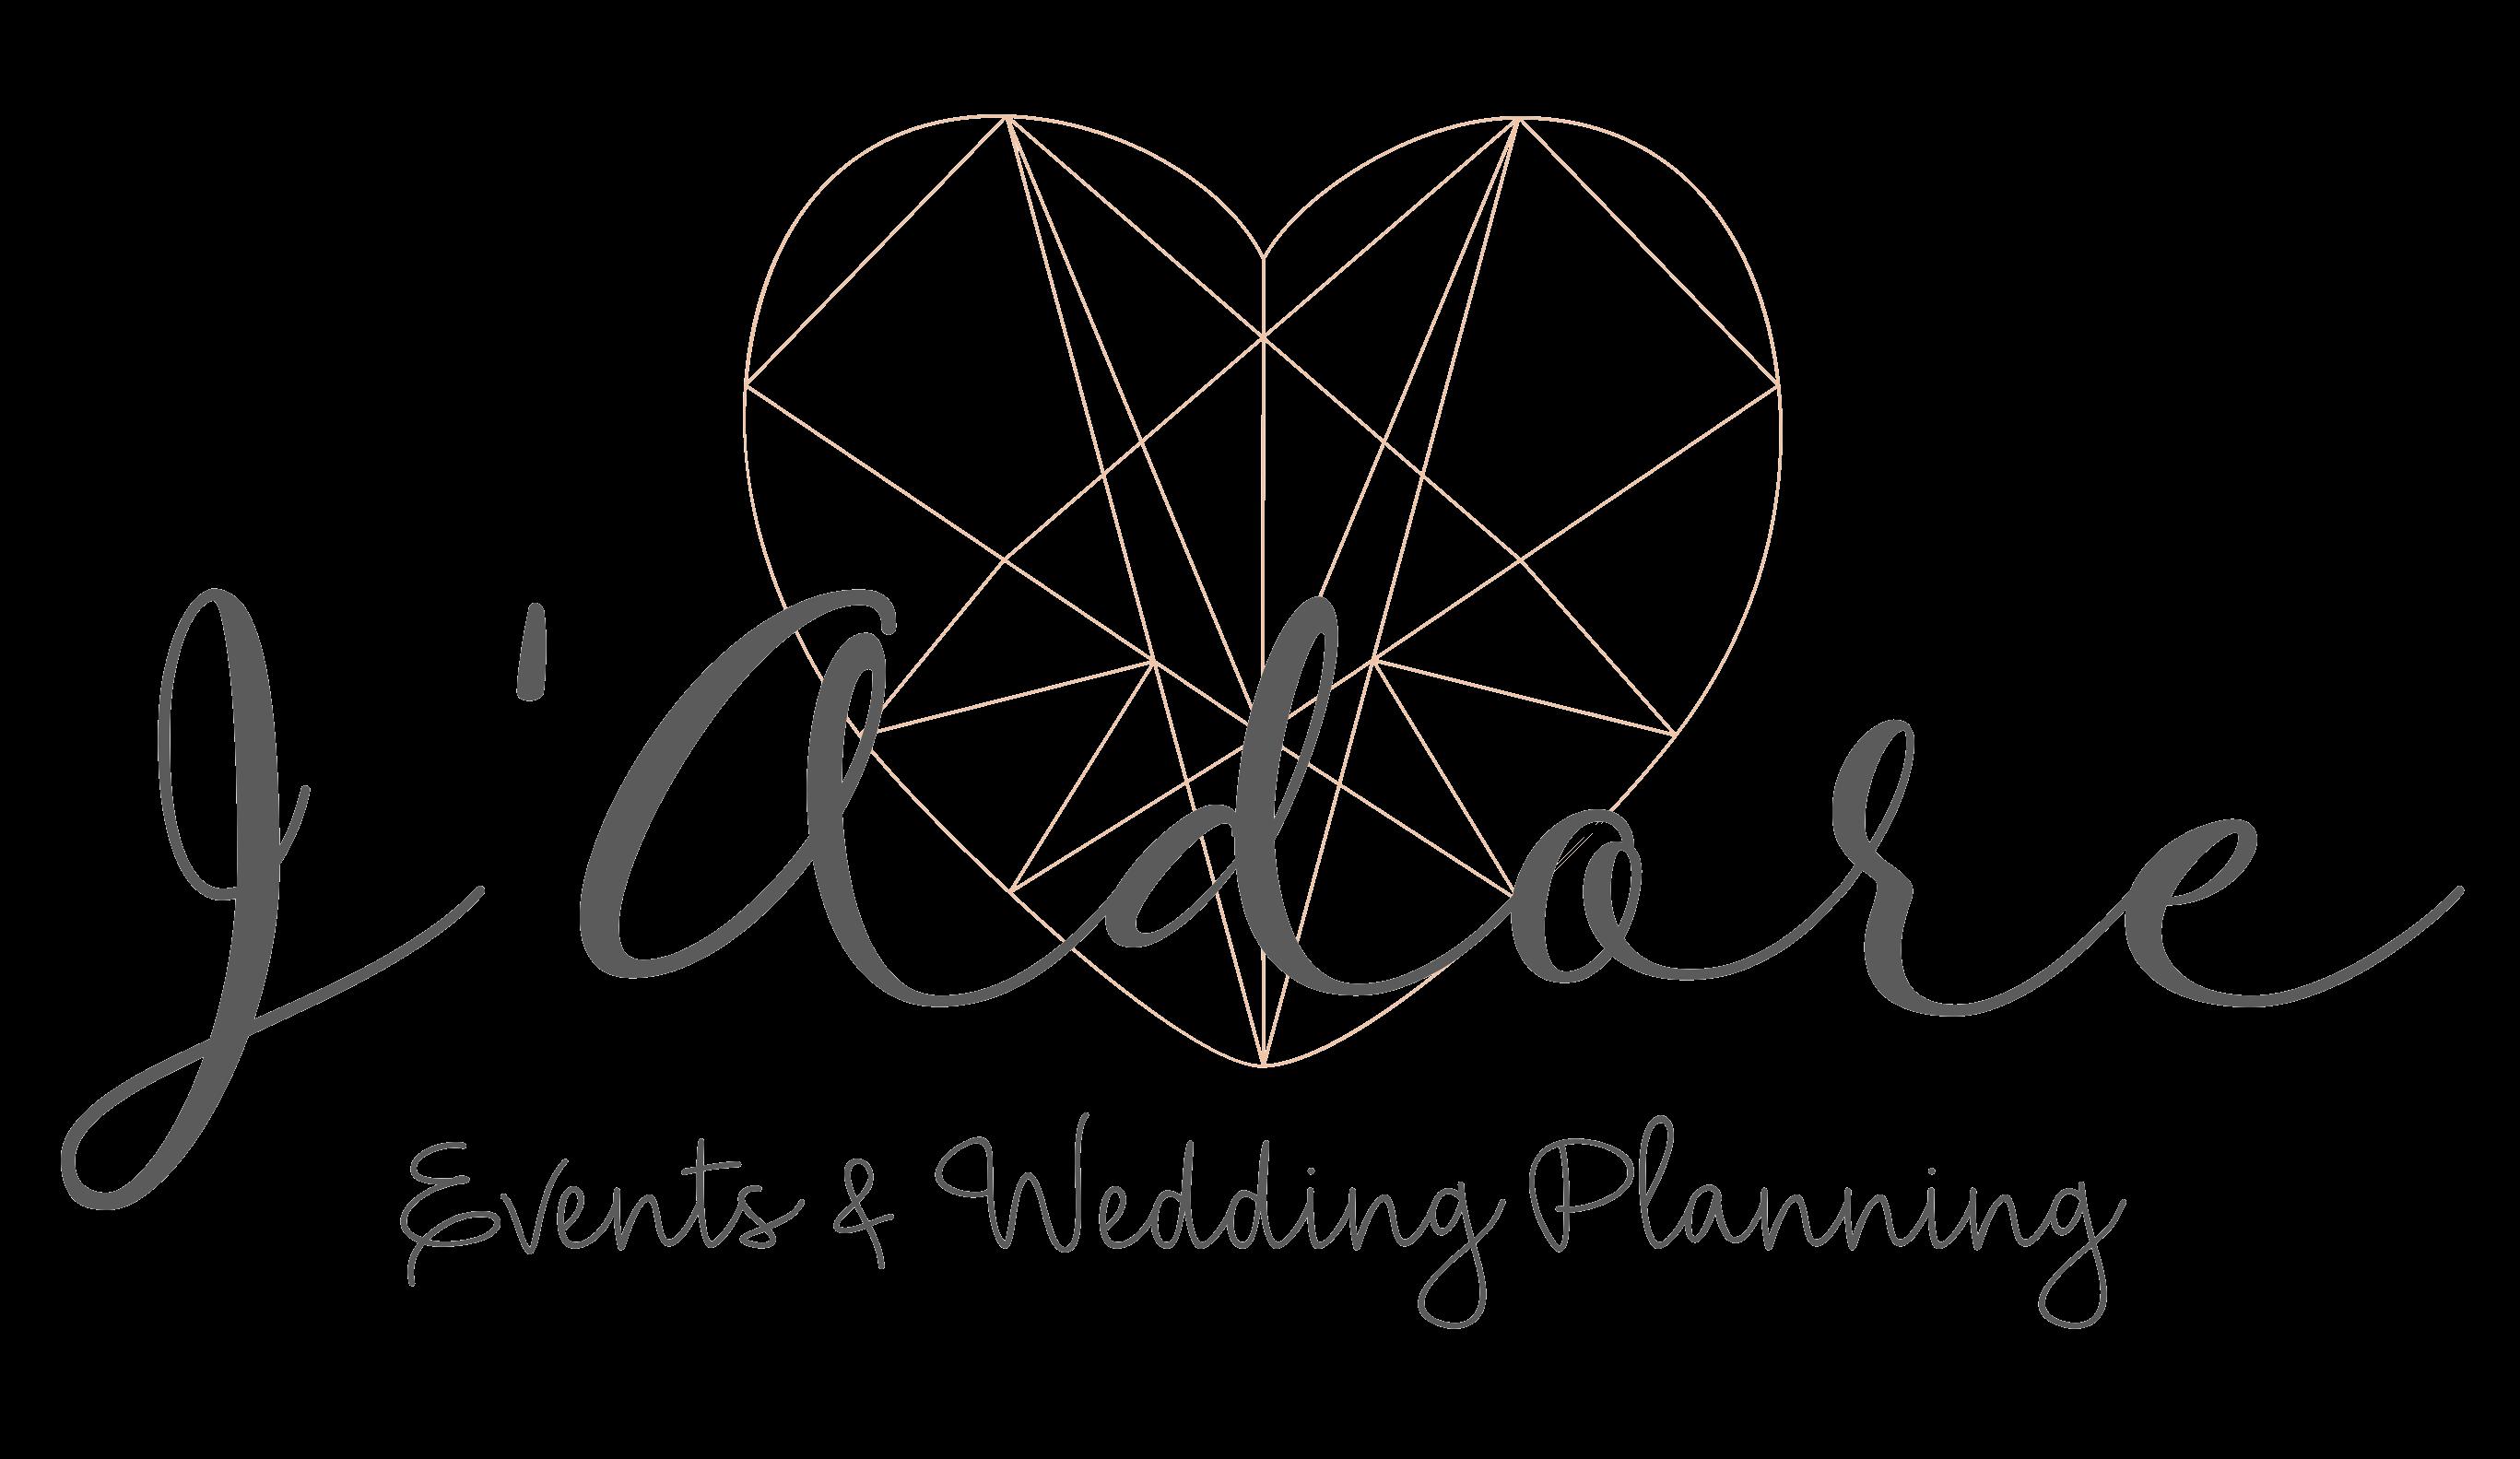 J´adore, Algarve Events & Wedding Planning